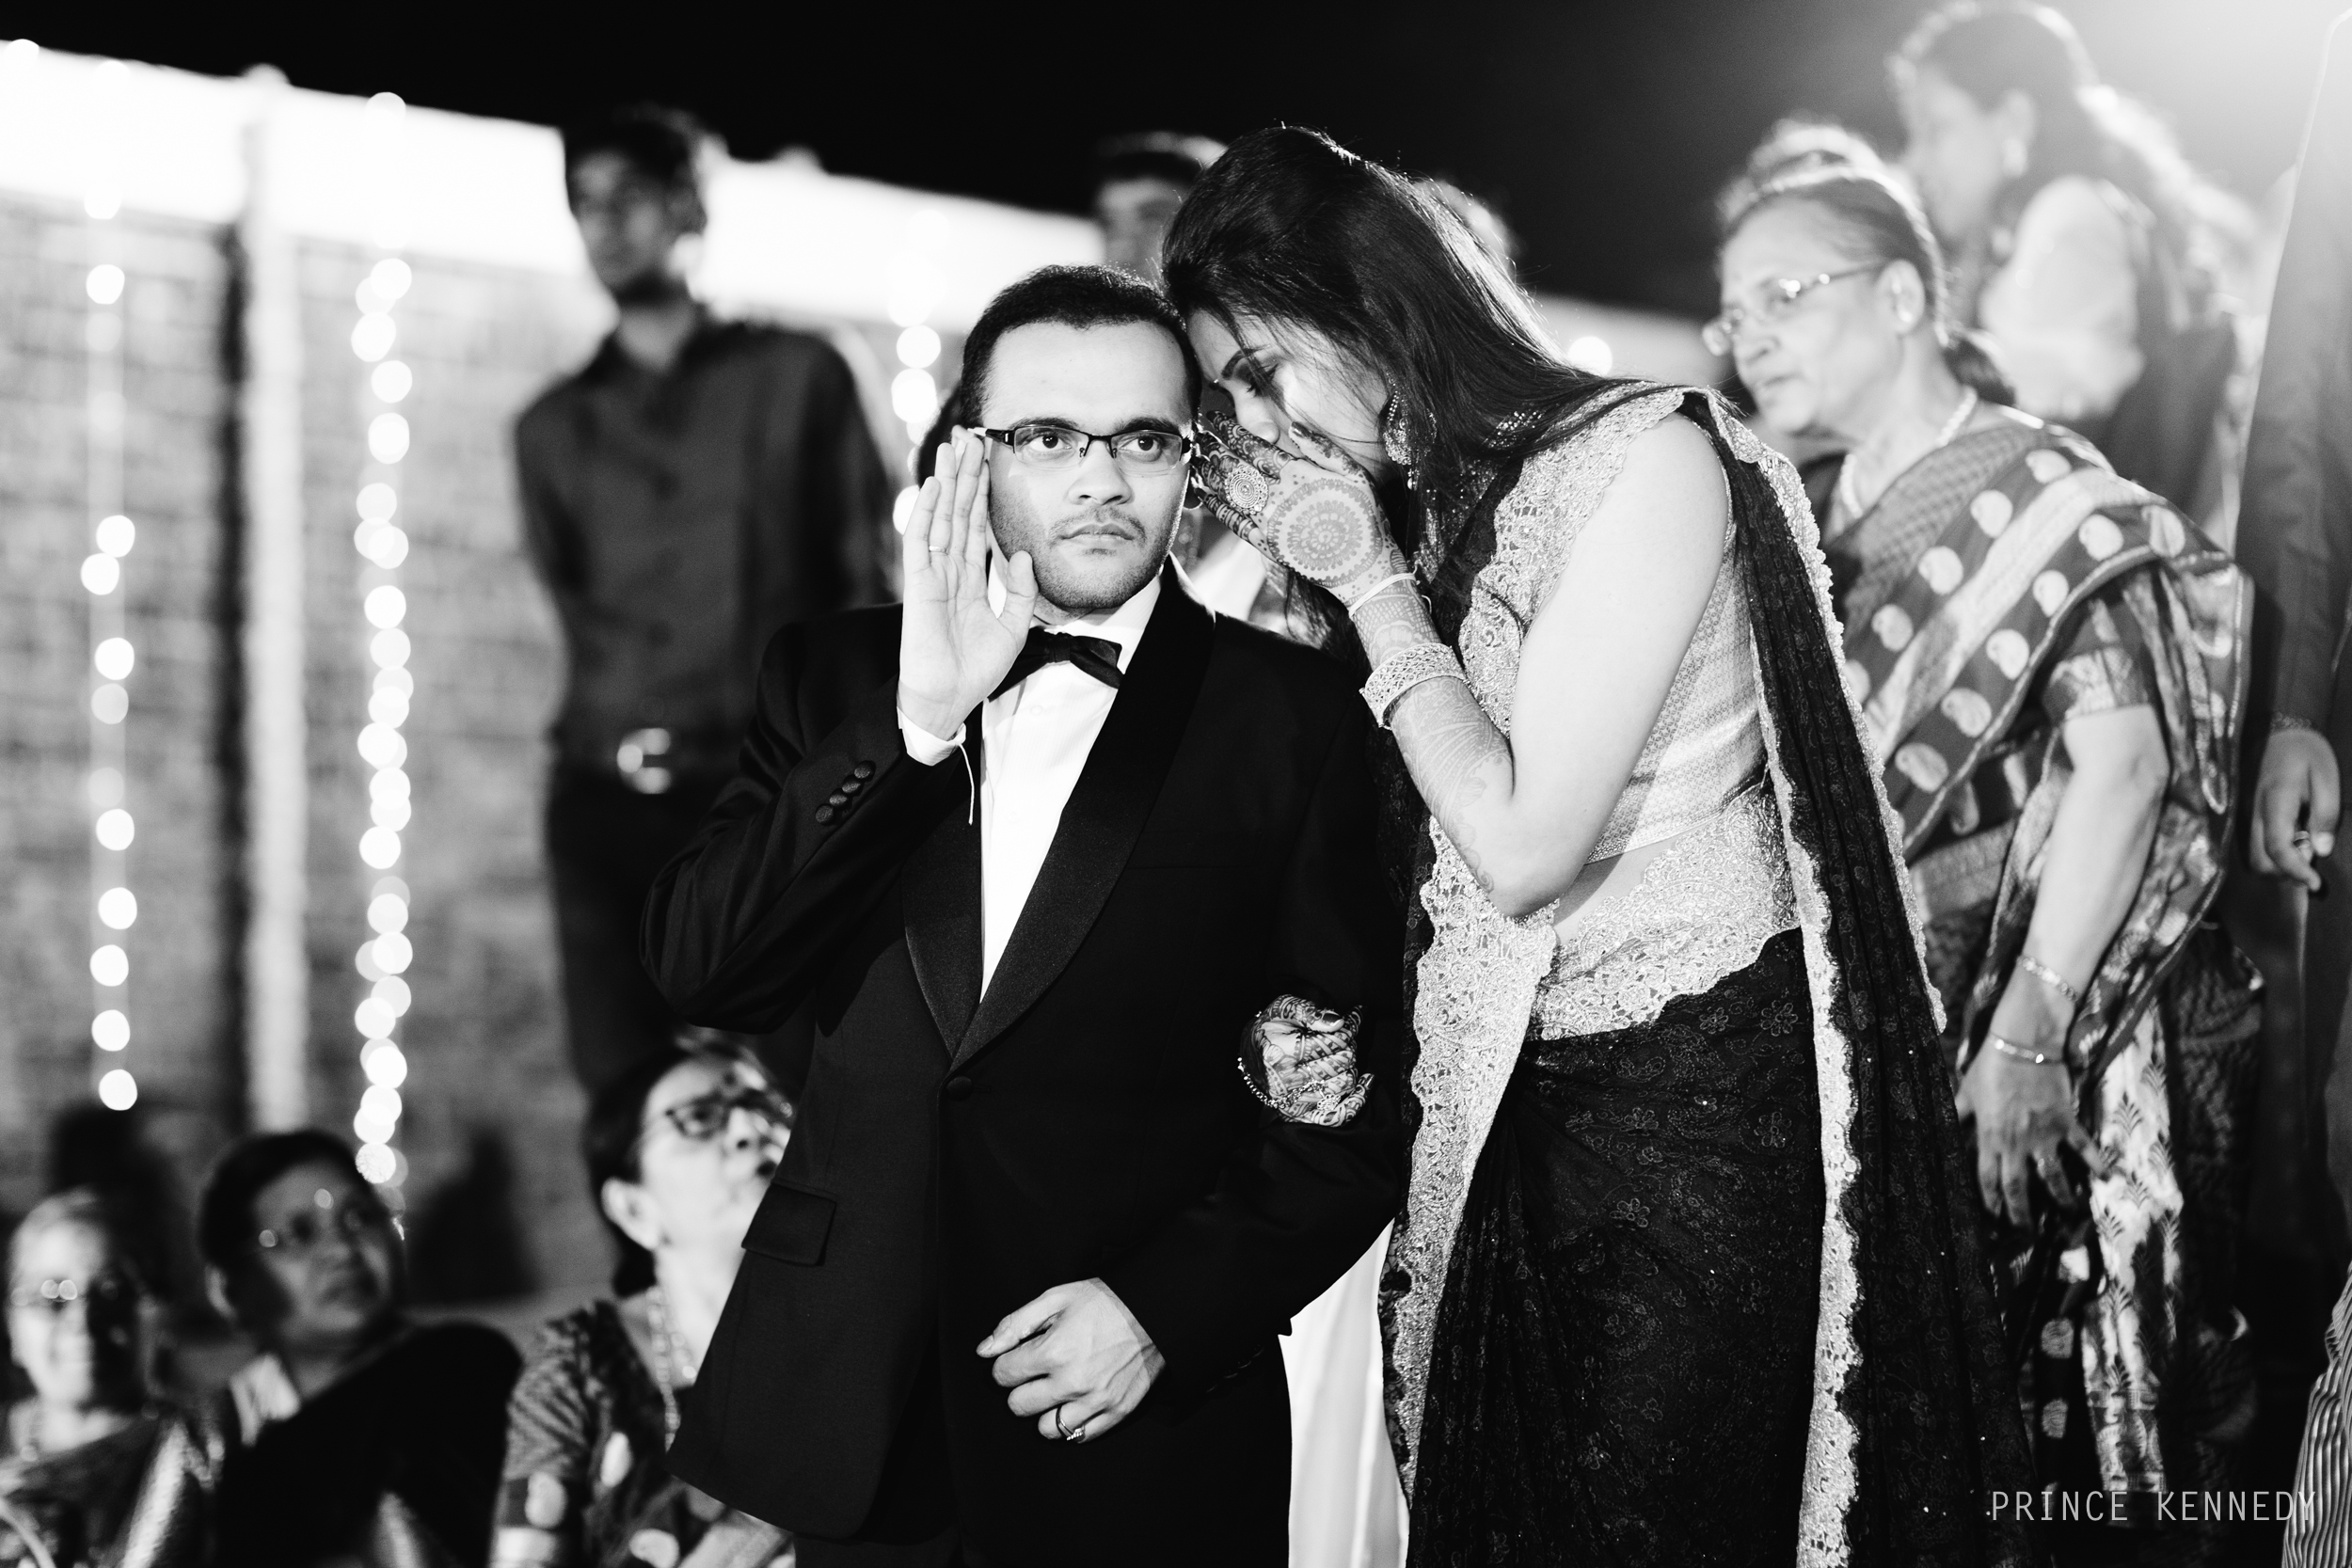 Athmajja-Nithesh-Engagement-Couple-Portrait-Portraiture-Wedding-Couple-Portrait-Chennai-Photographer-Candid-Photography-Destination-Best-Prince-Kennedy-Photography-82.jpg